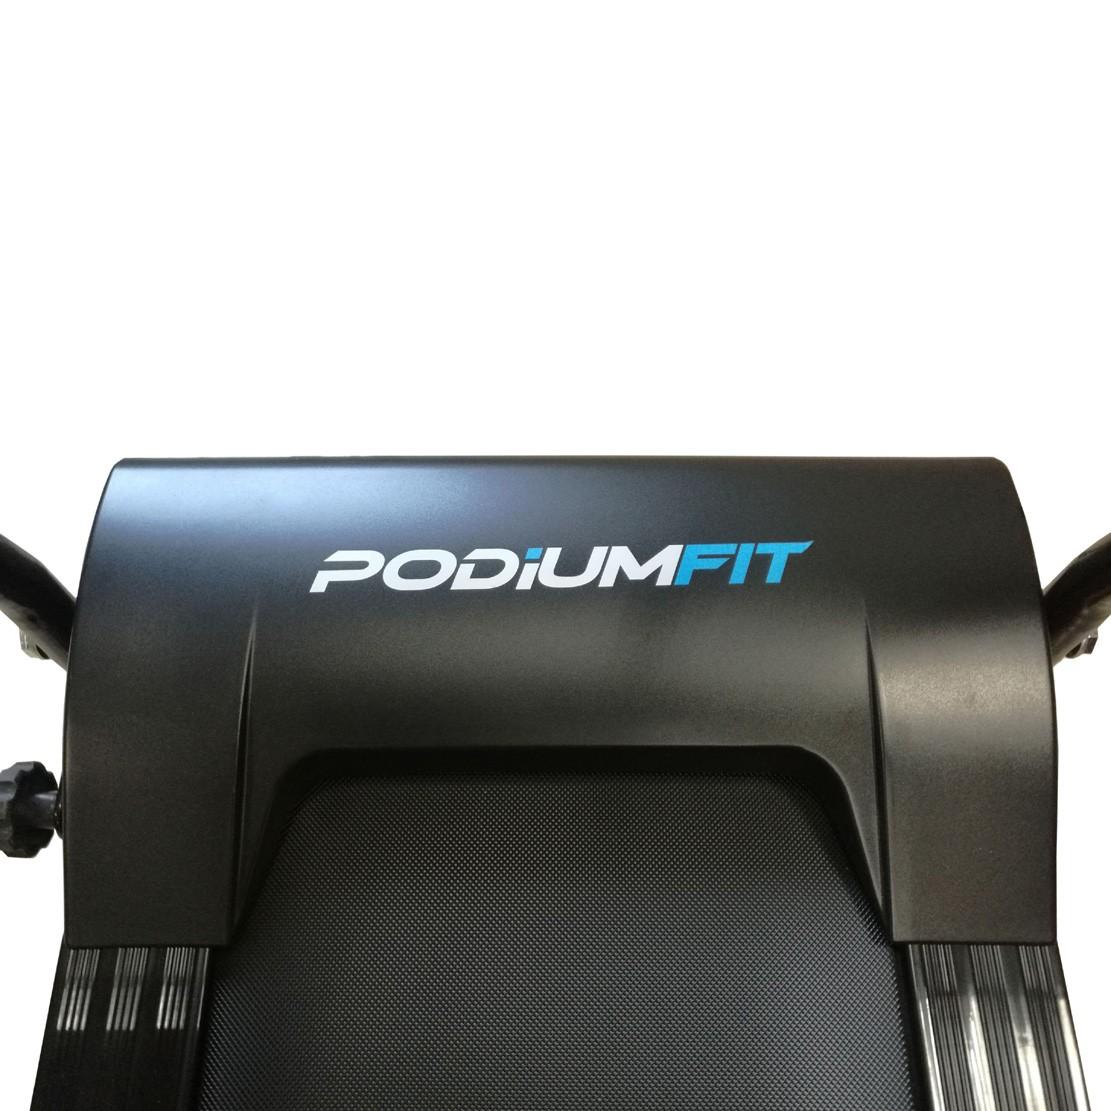 Esteira Elétrica Podiumfit X100 110v / 12progs / Dobravel / Silenciosa